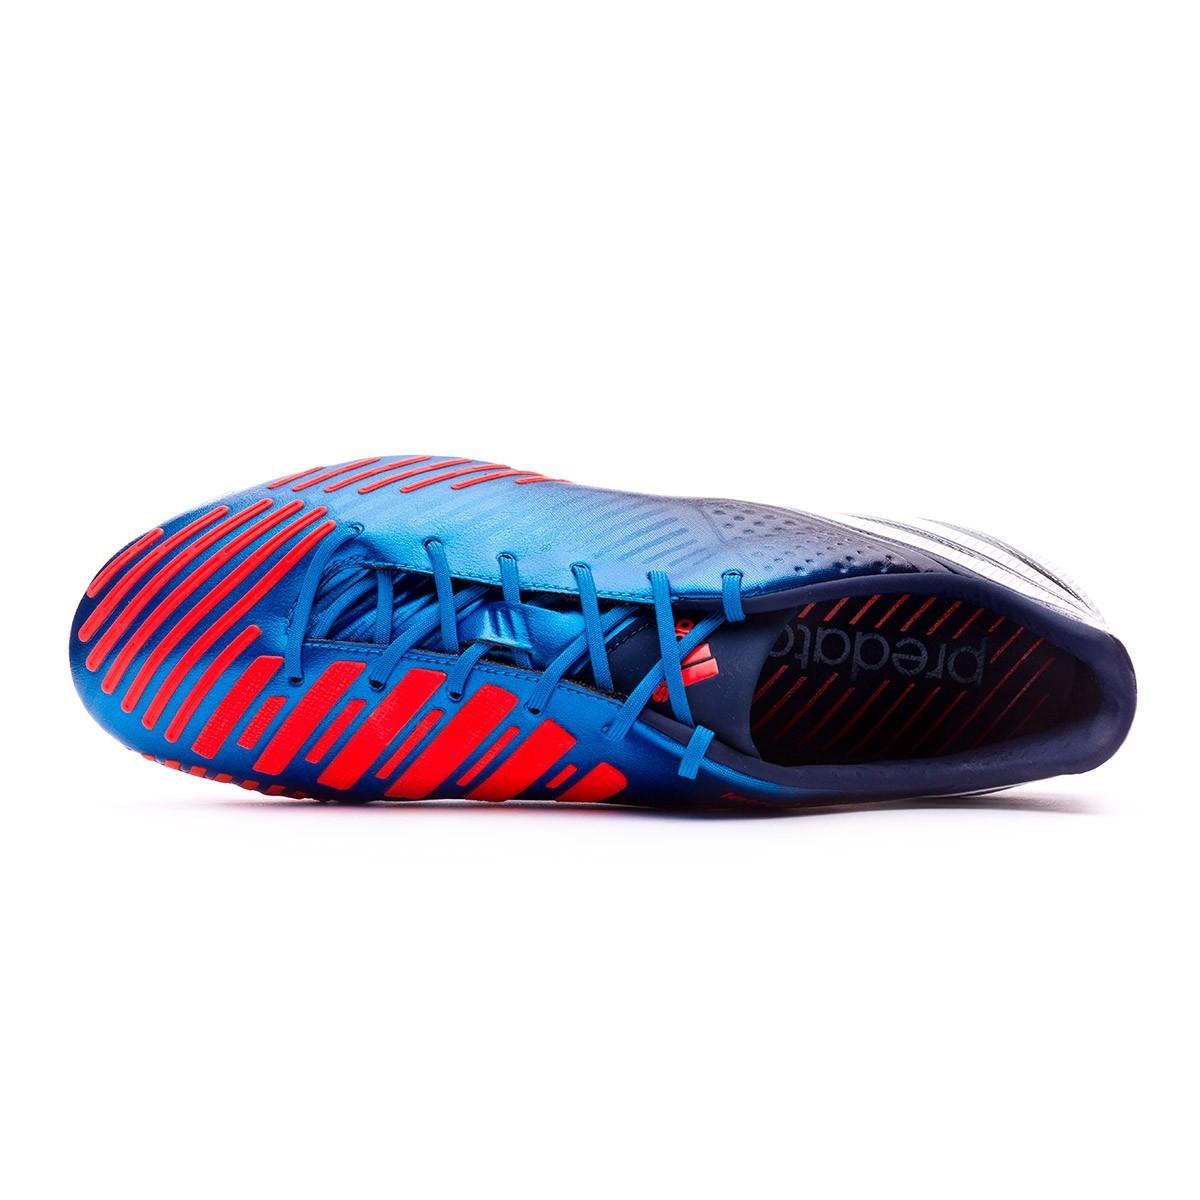 save off c5b83 8841f ... hot bota de fútbol adidas predator lz trx fg azul blanco infrarrojo  soloporteros es ahora fútbol